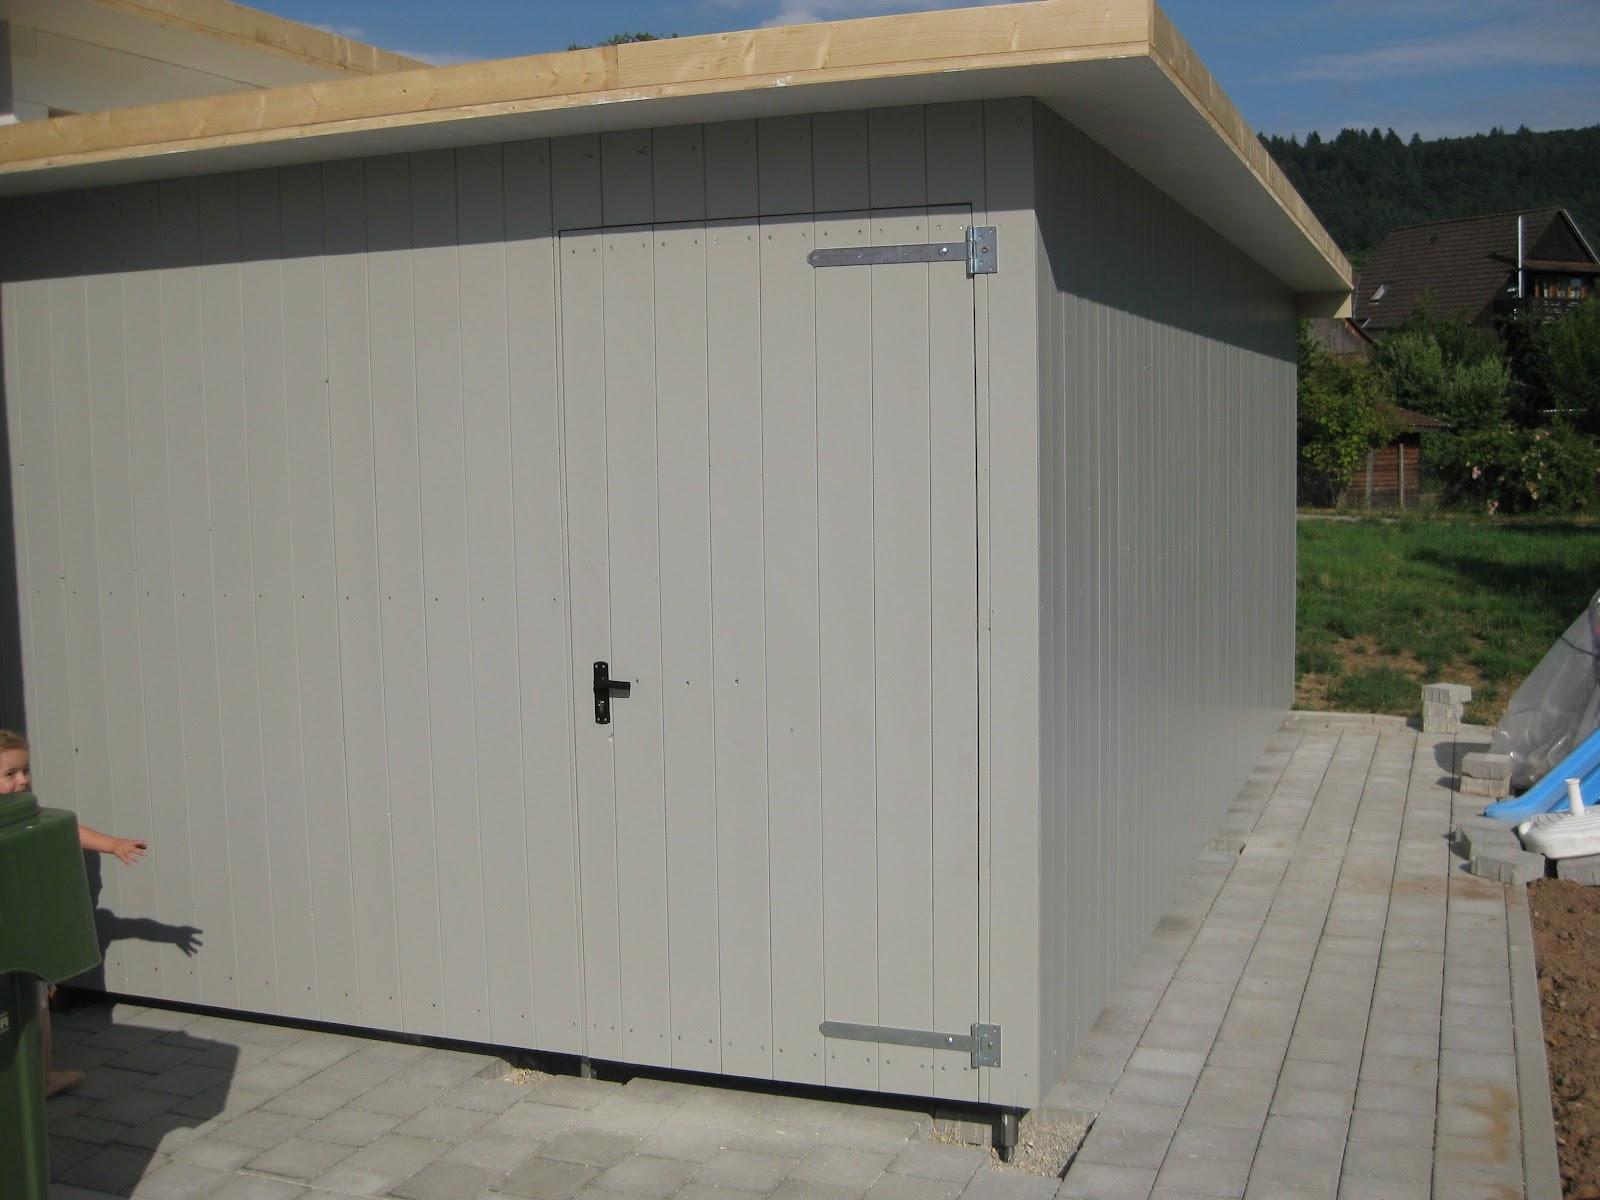 wir bauen ein okal haus carport schalung abgeschlossen. Black Bedroom Furniture Sets. Home Design Ideas